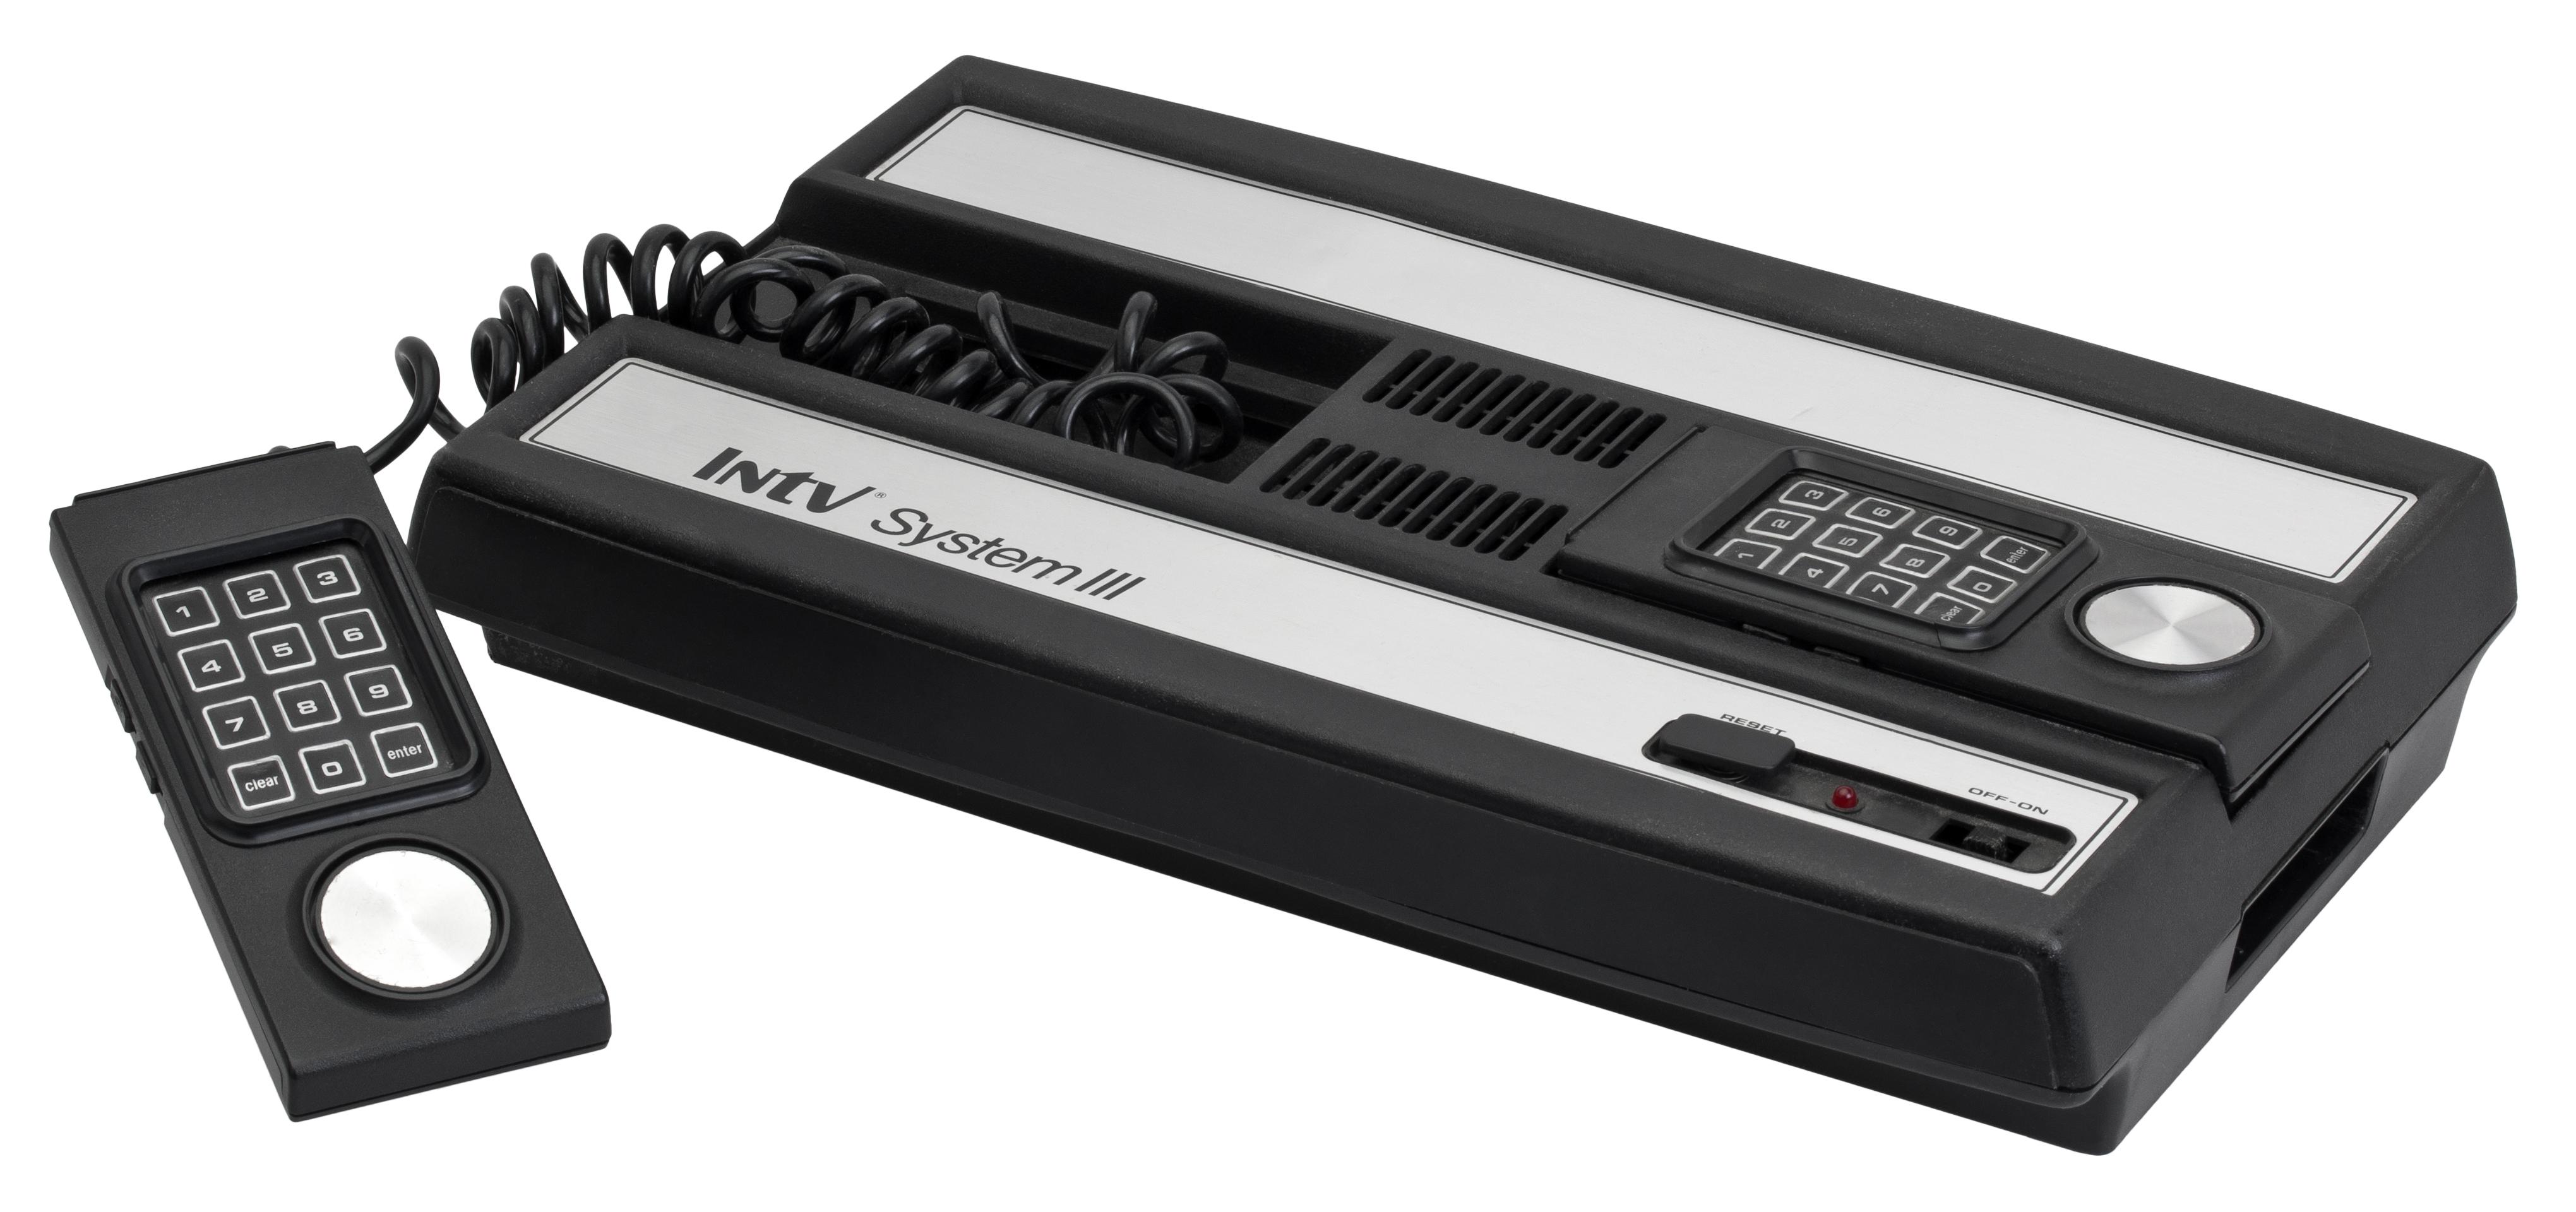 INTV-System-III-Console.jpg